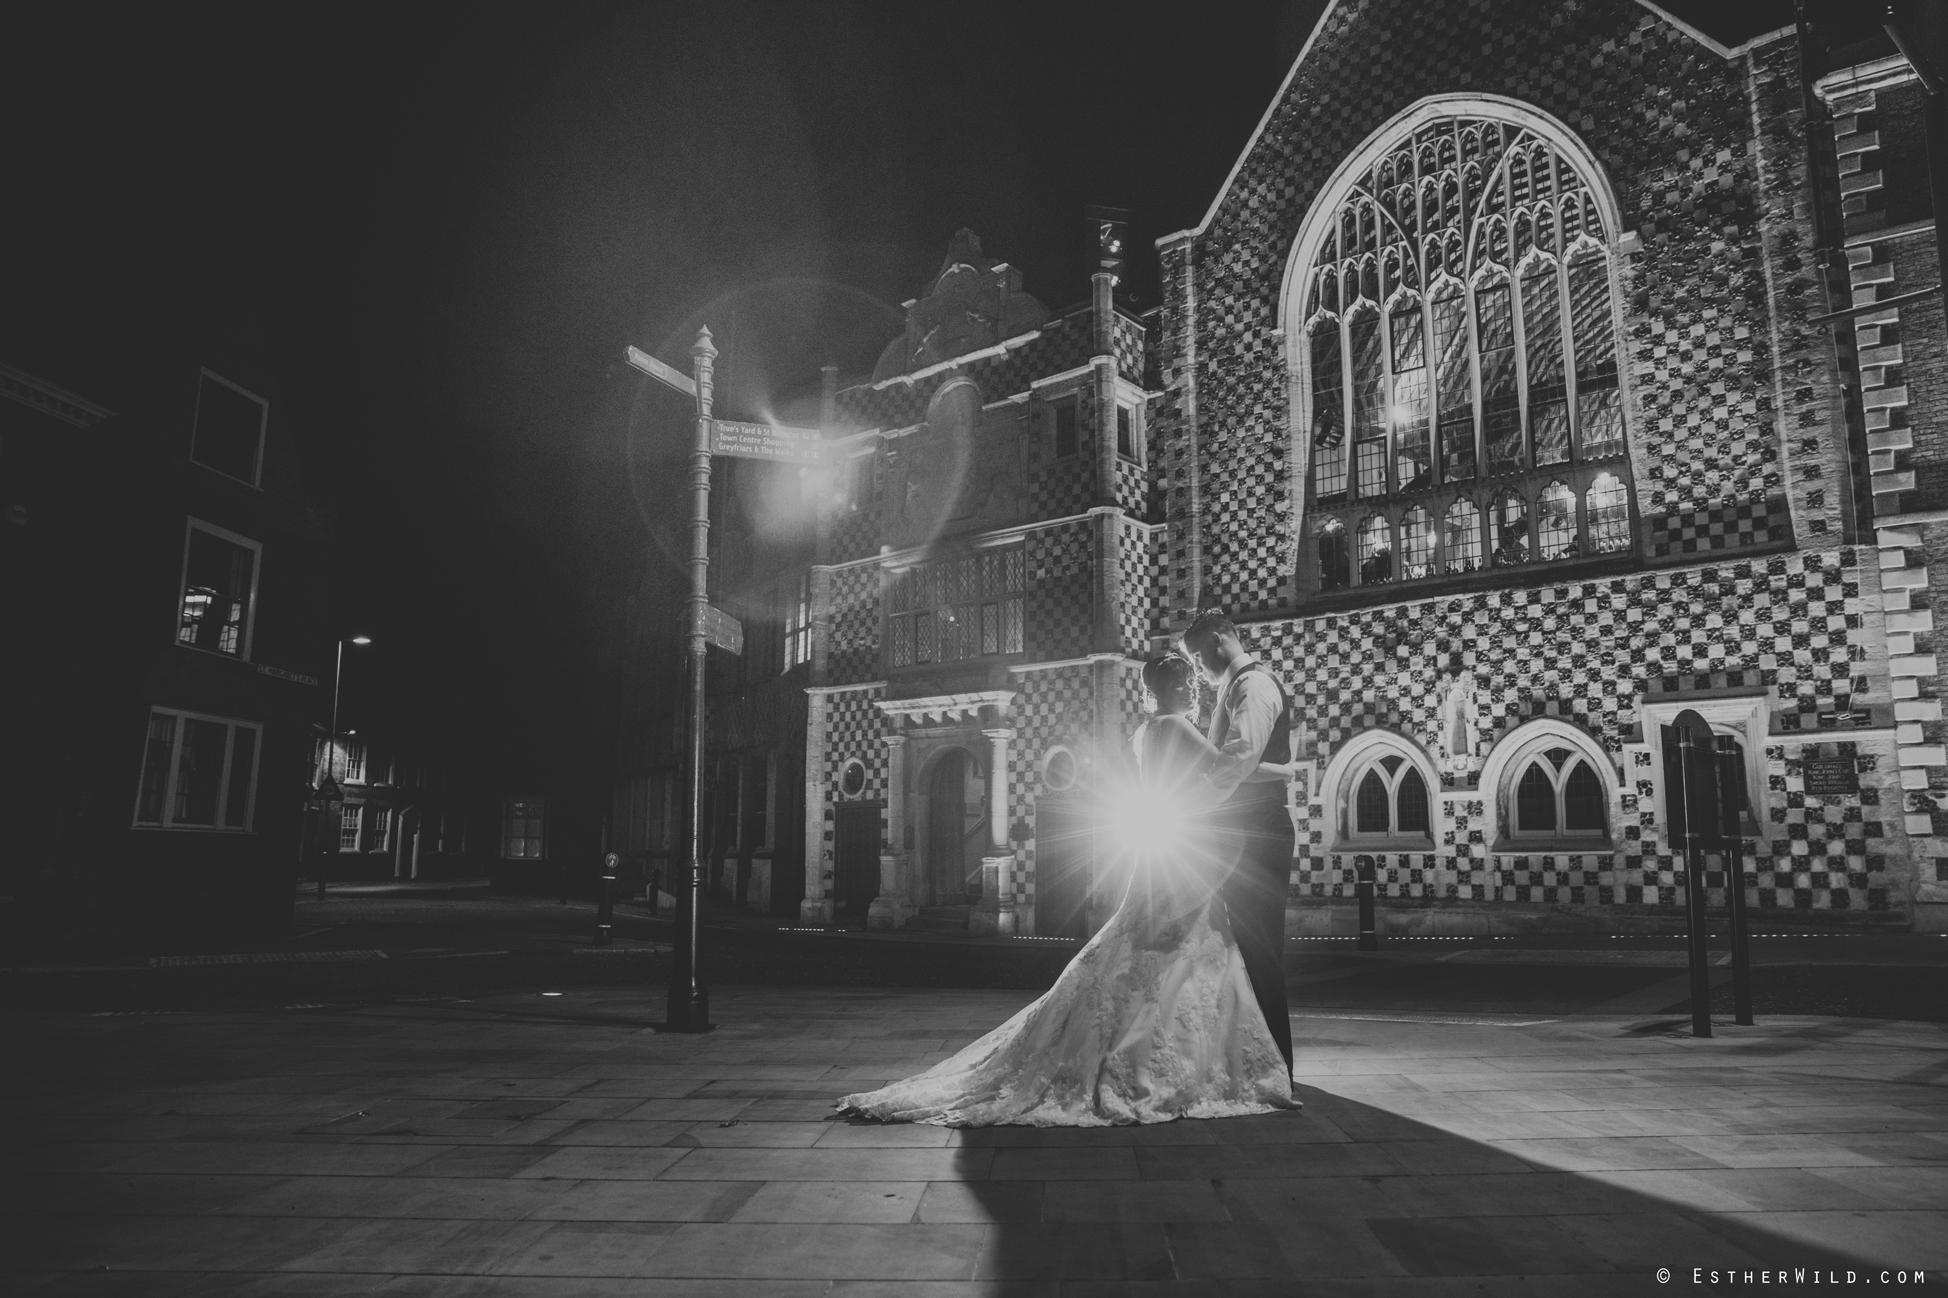 1017_Kings_Lynn_Town_Hall_Bank_House_Hotel_Wedding_Esther_Wild_PhotograpgherIMG_7080-2.jpg